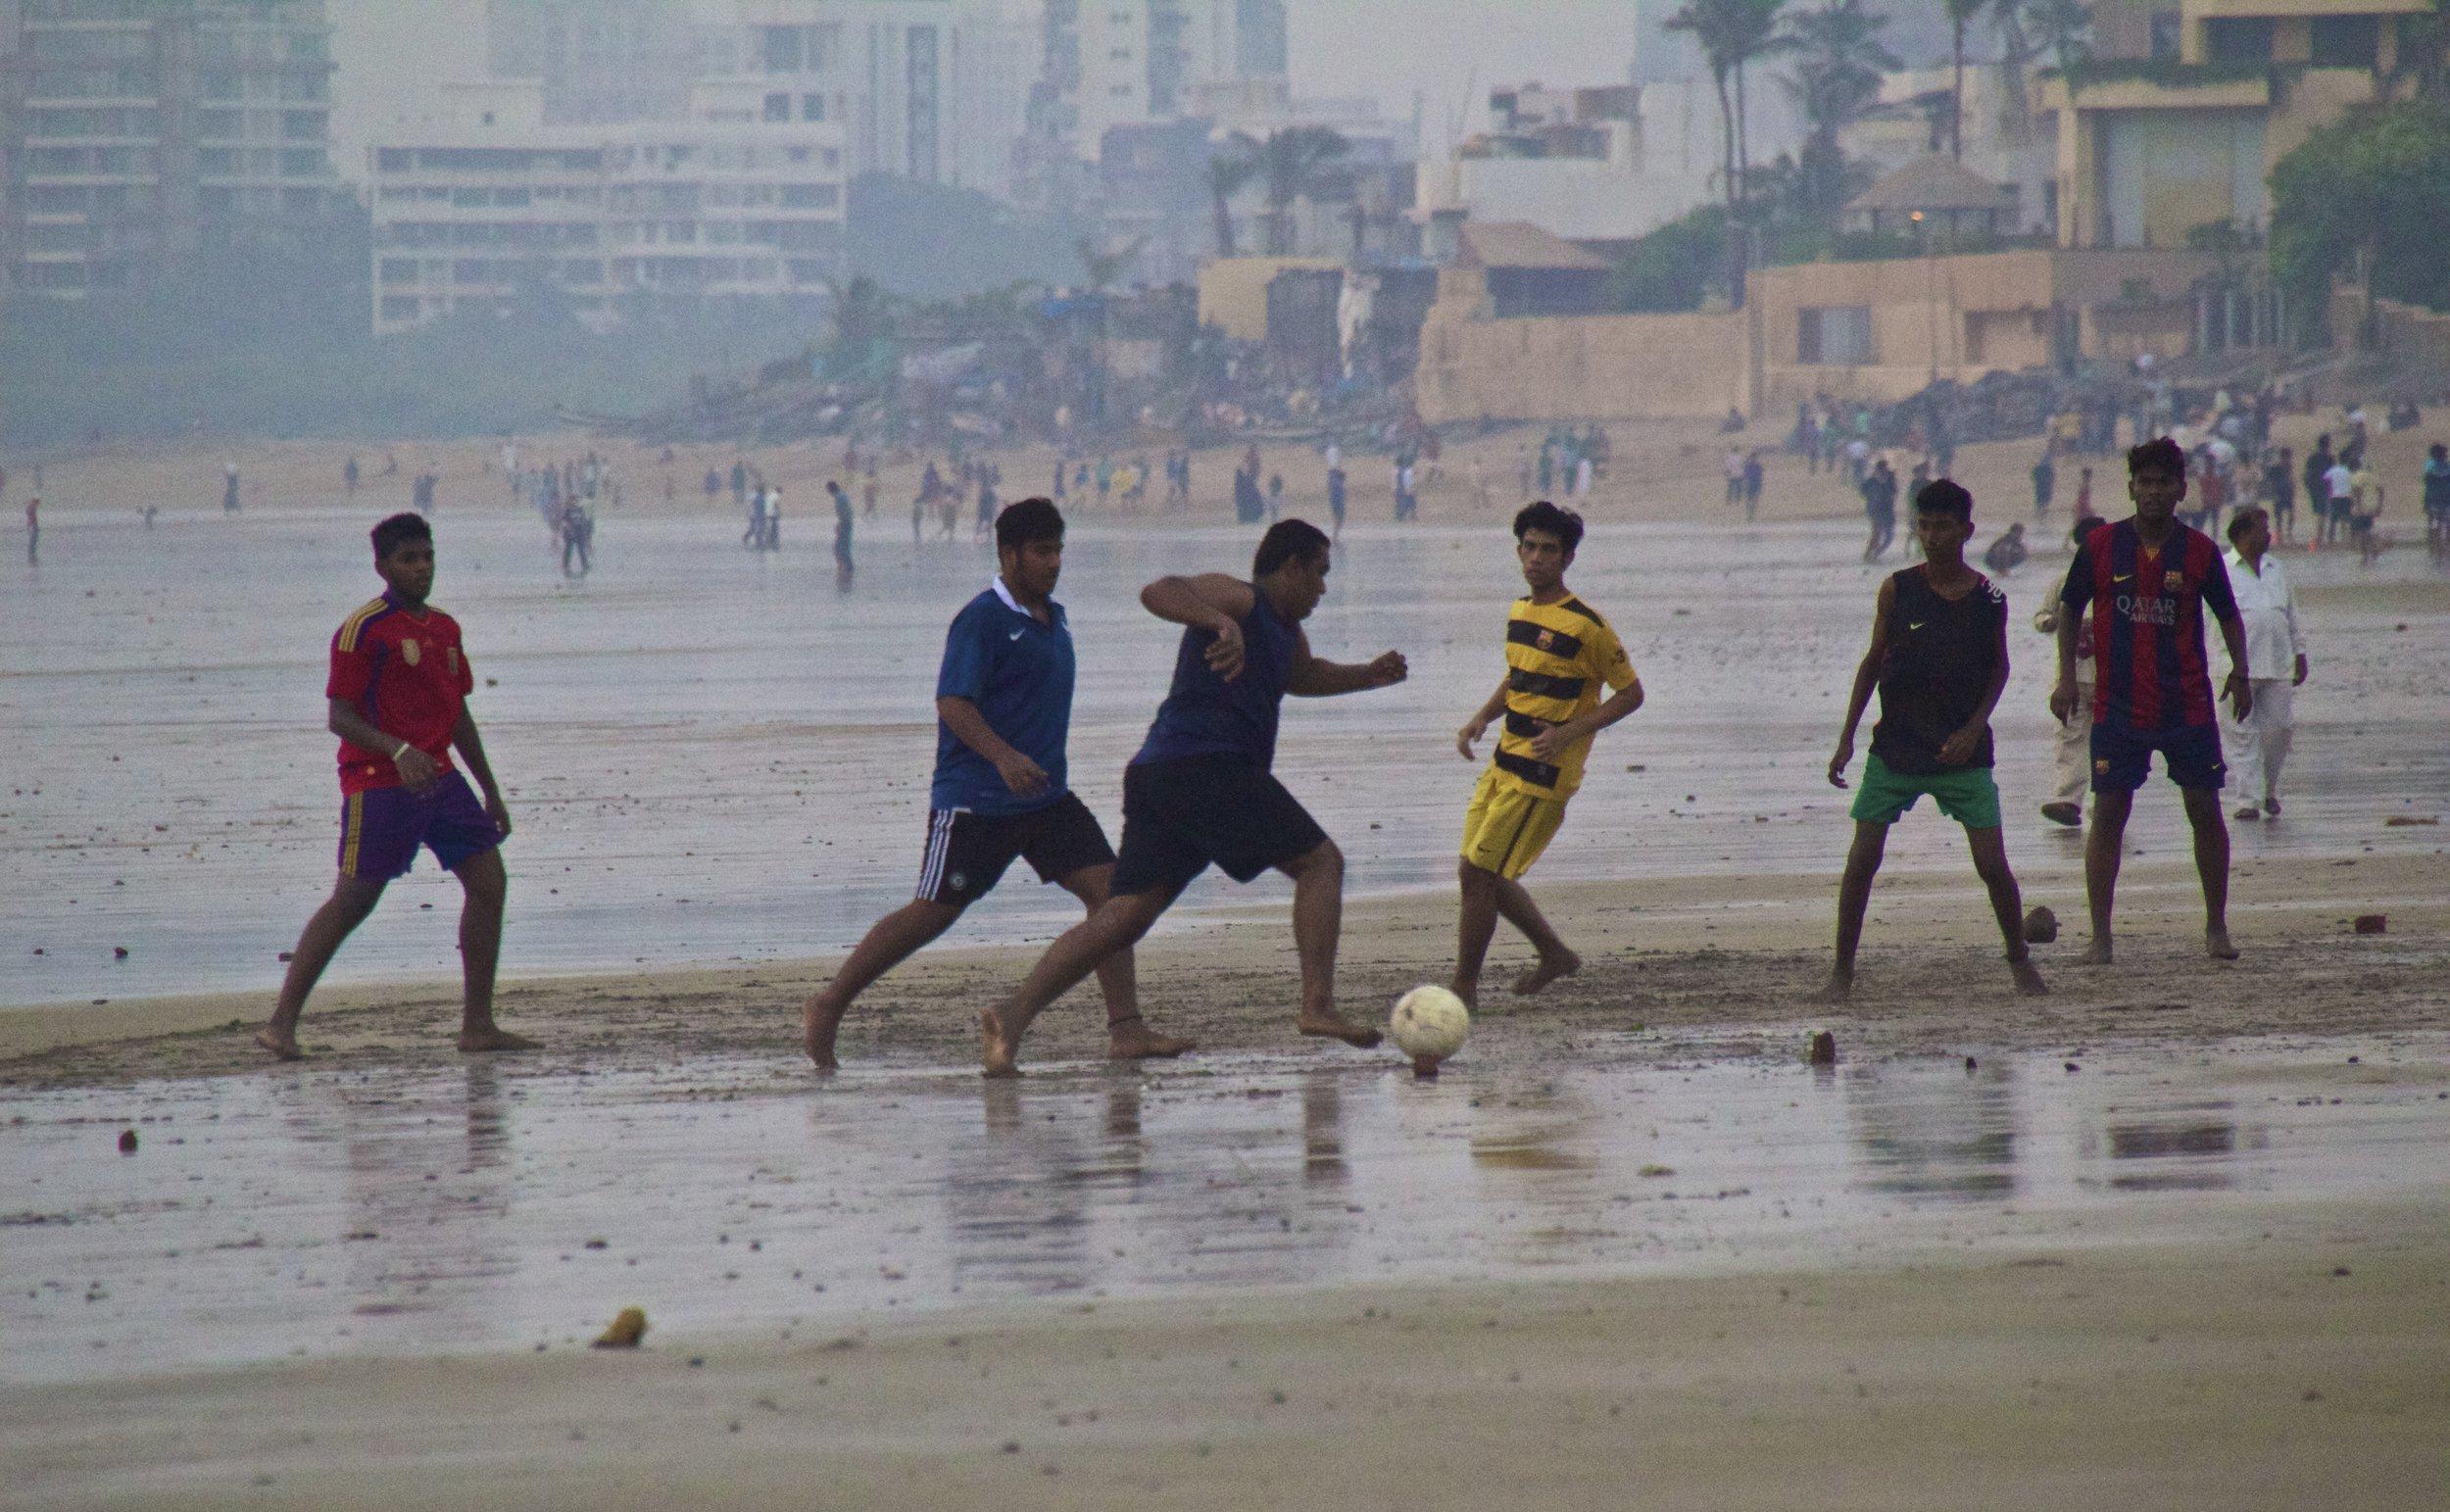 juhu beach mumbai bombay india photography 3.jpg